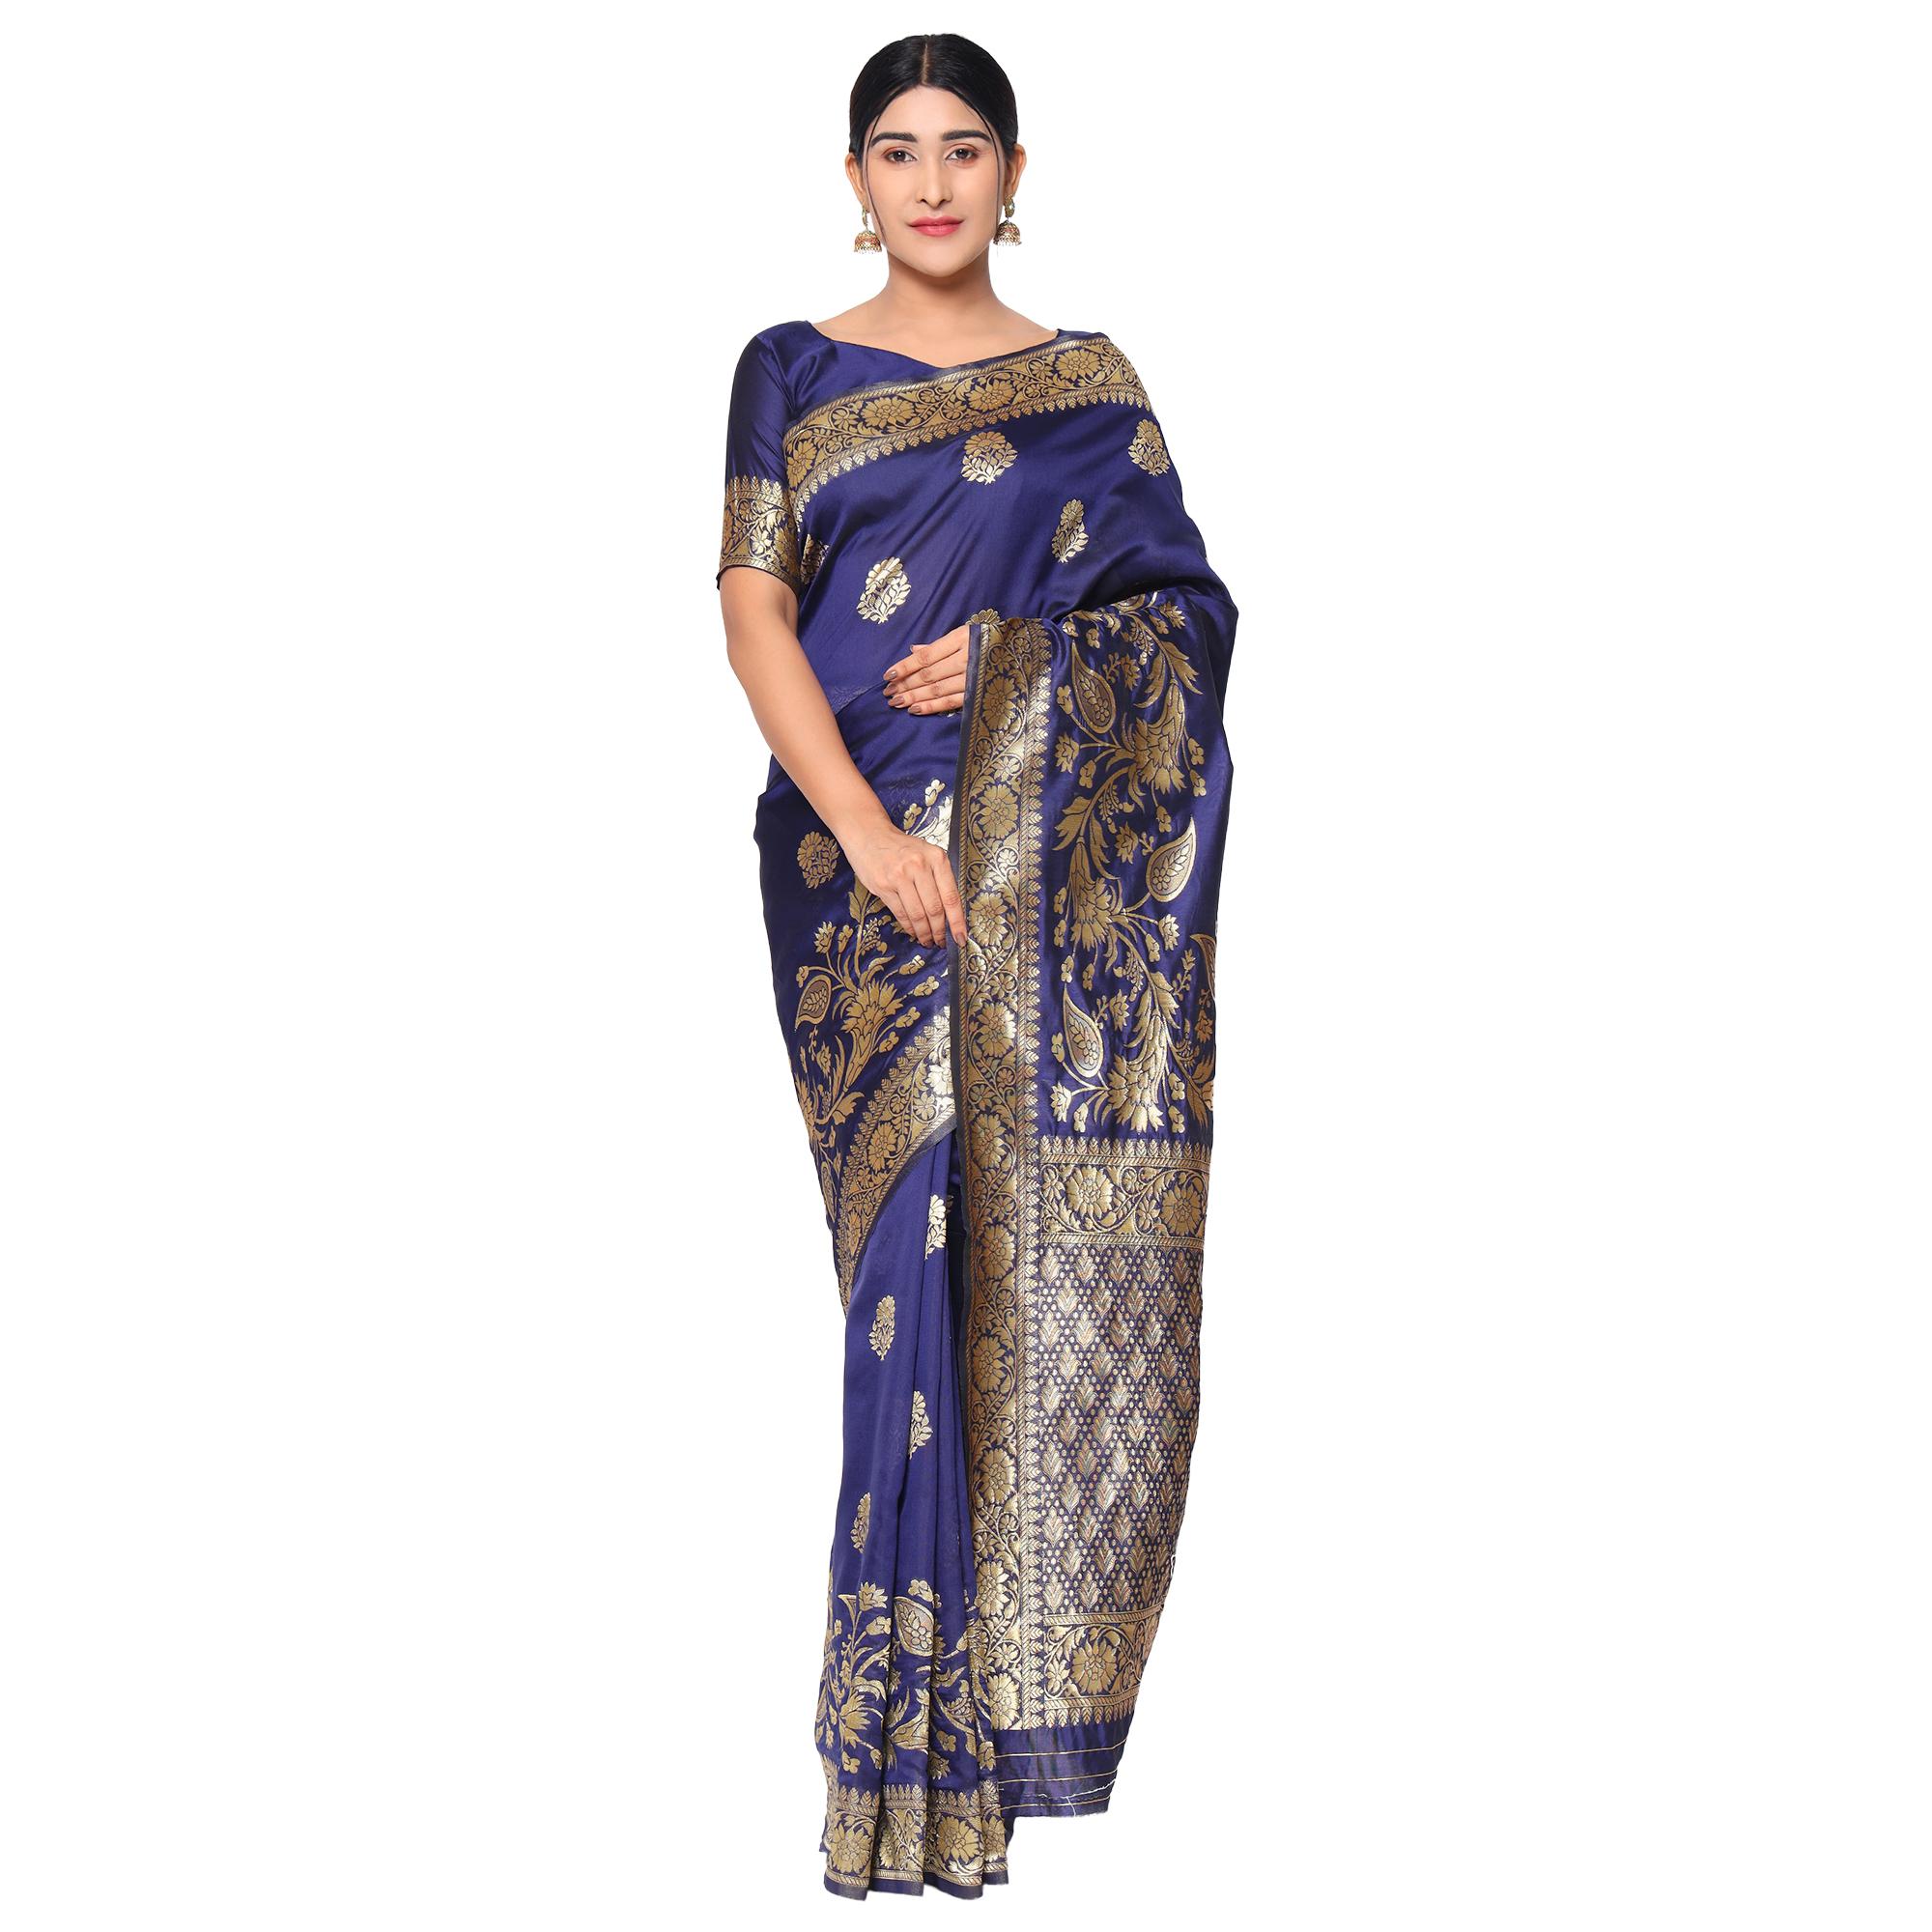 Glemora Nevy Blue Fancy Ethnic Wear Silk Blend Banarasi Traditional Saree